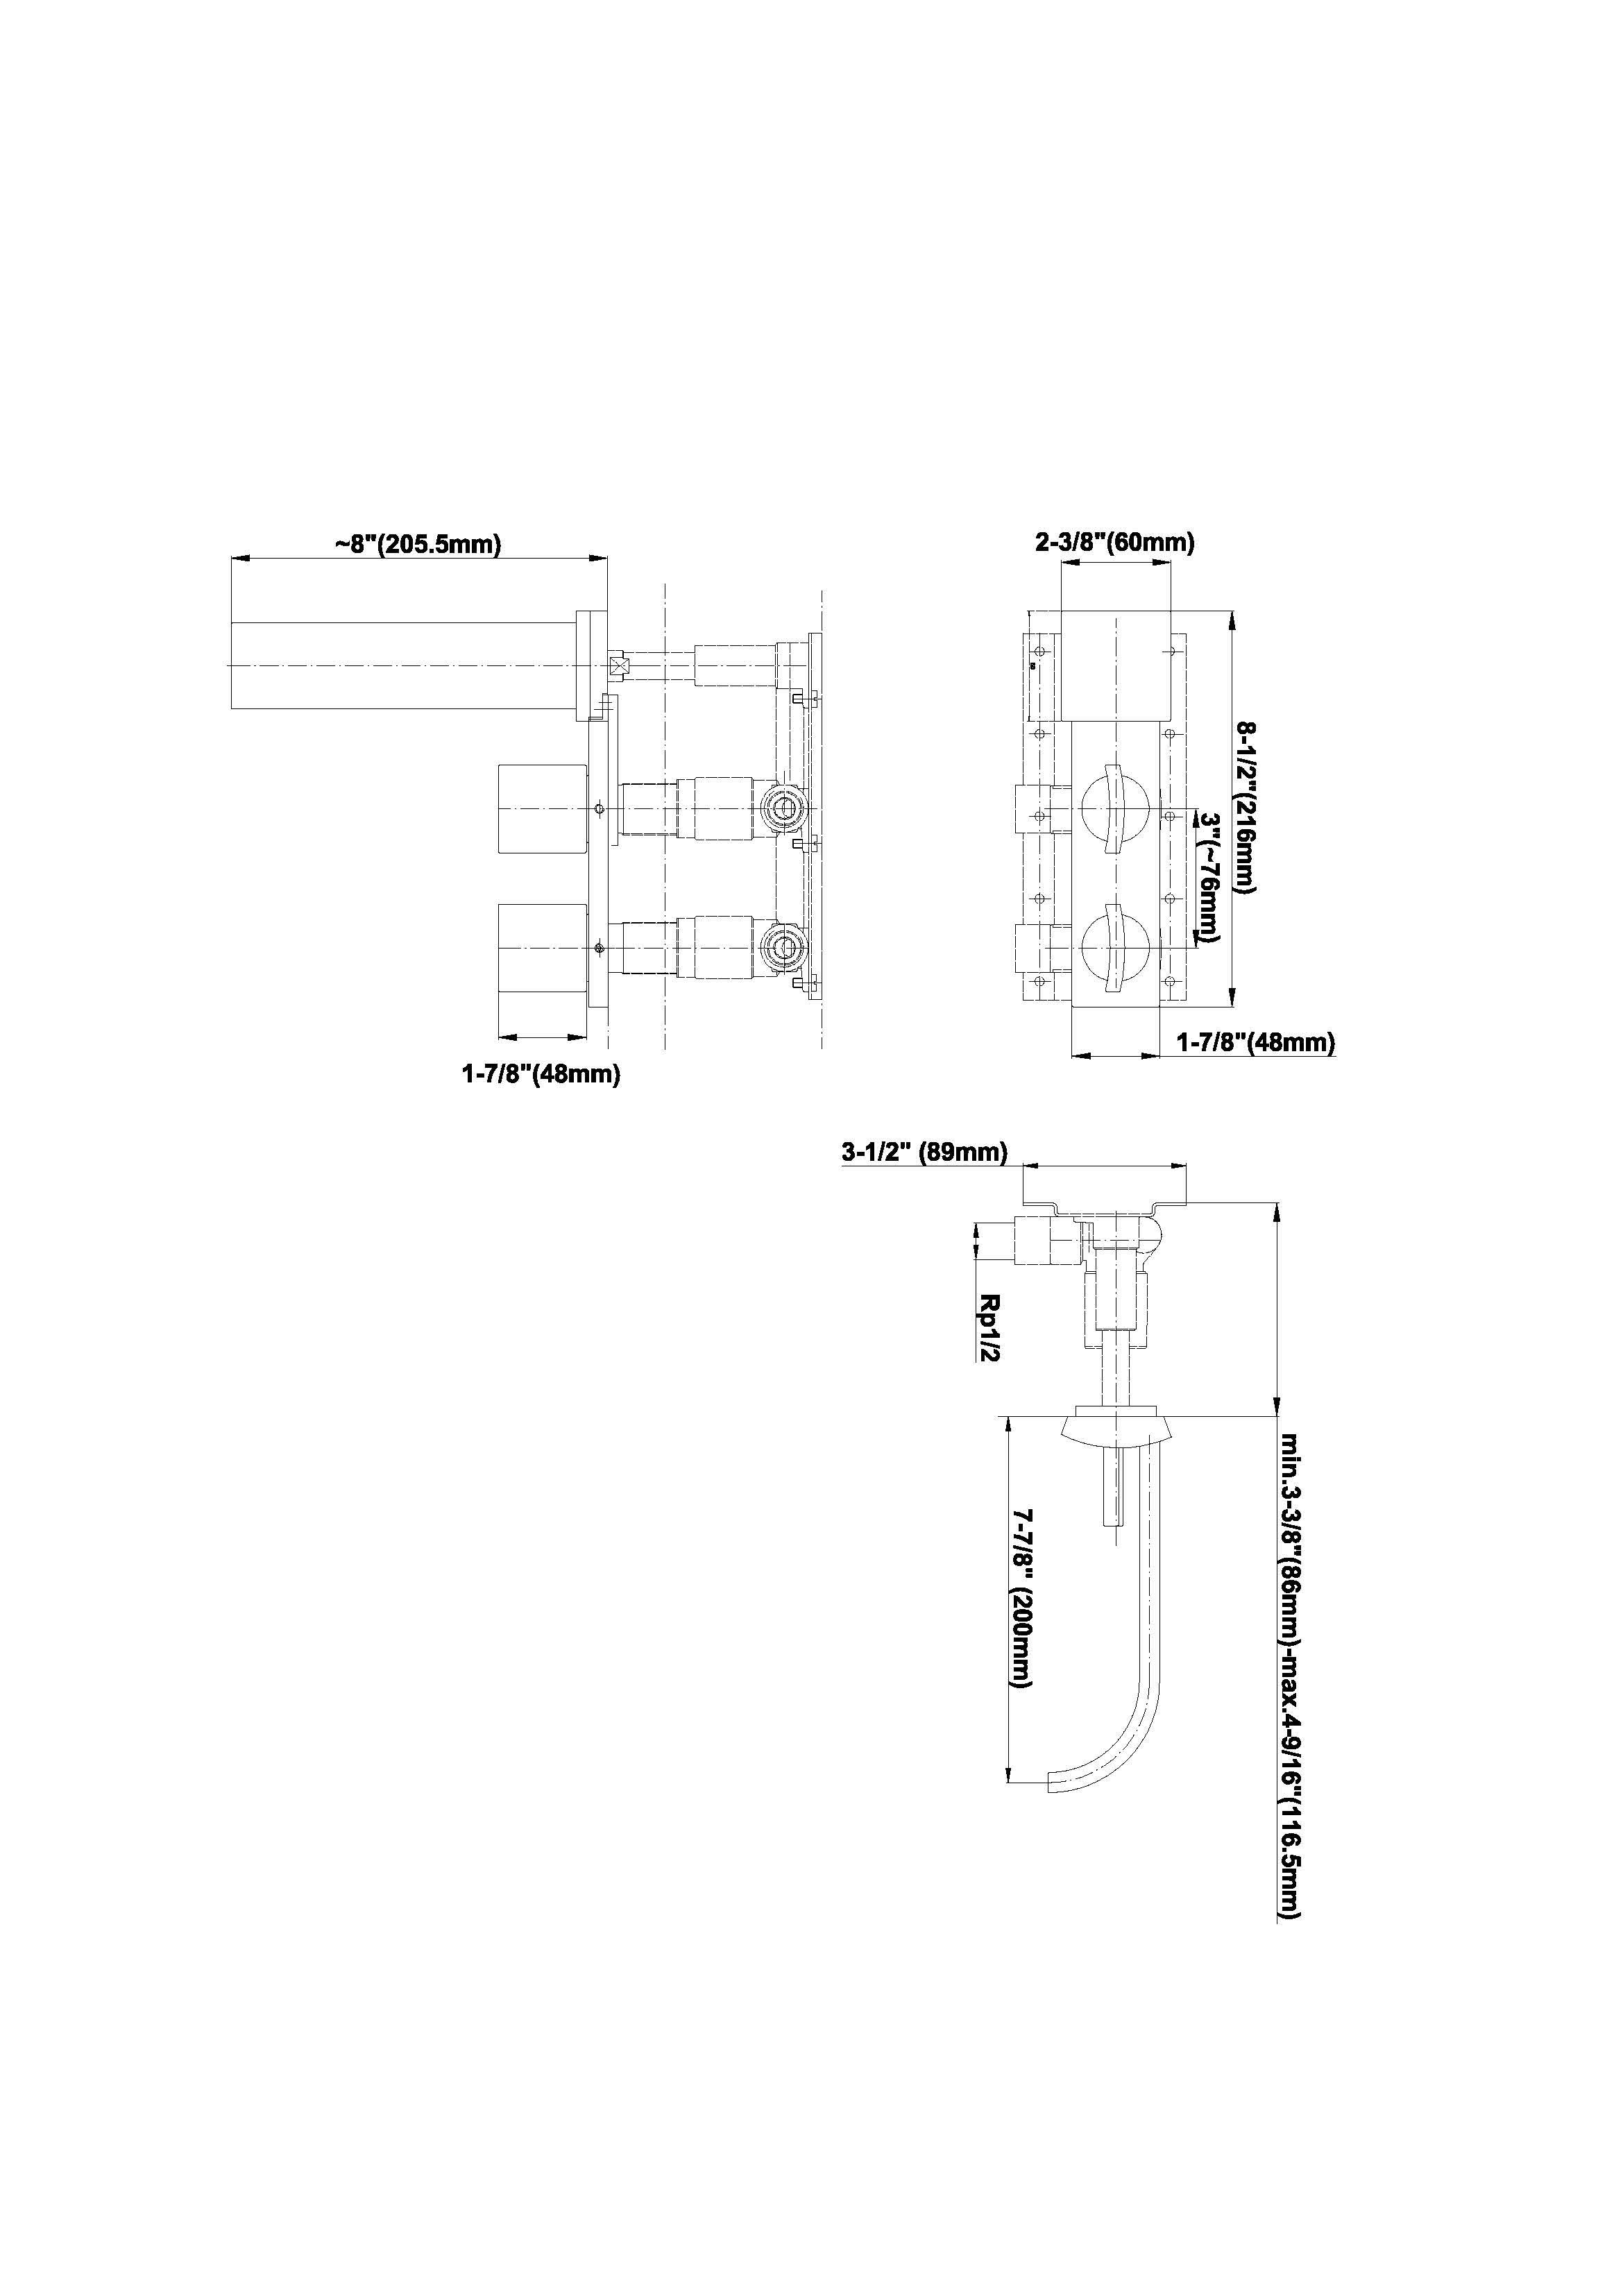 Baterie de lavoar montaj perete Graff Sade 2332080 Fisa tehnica